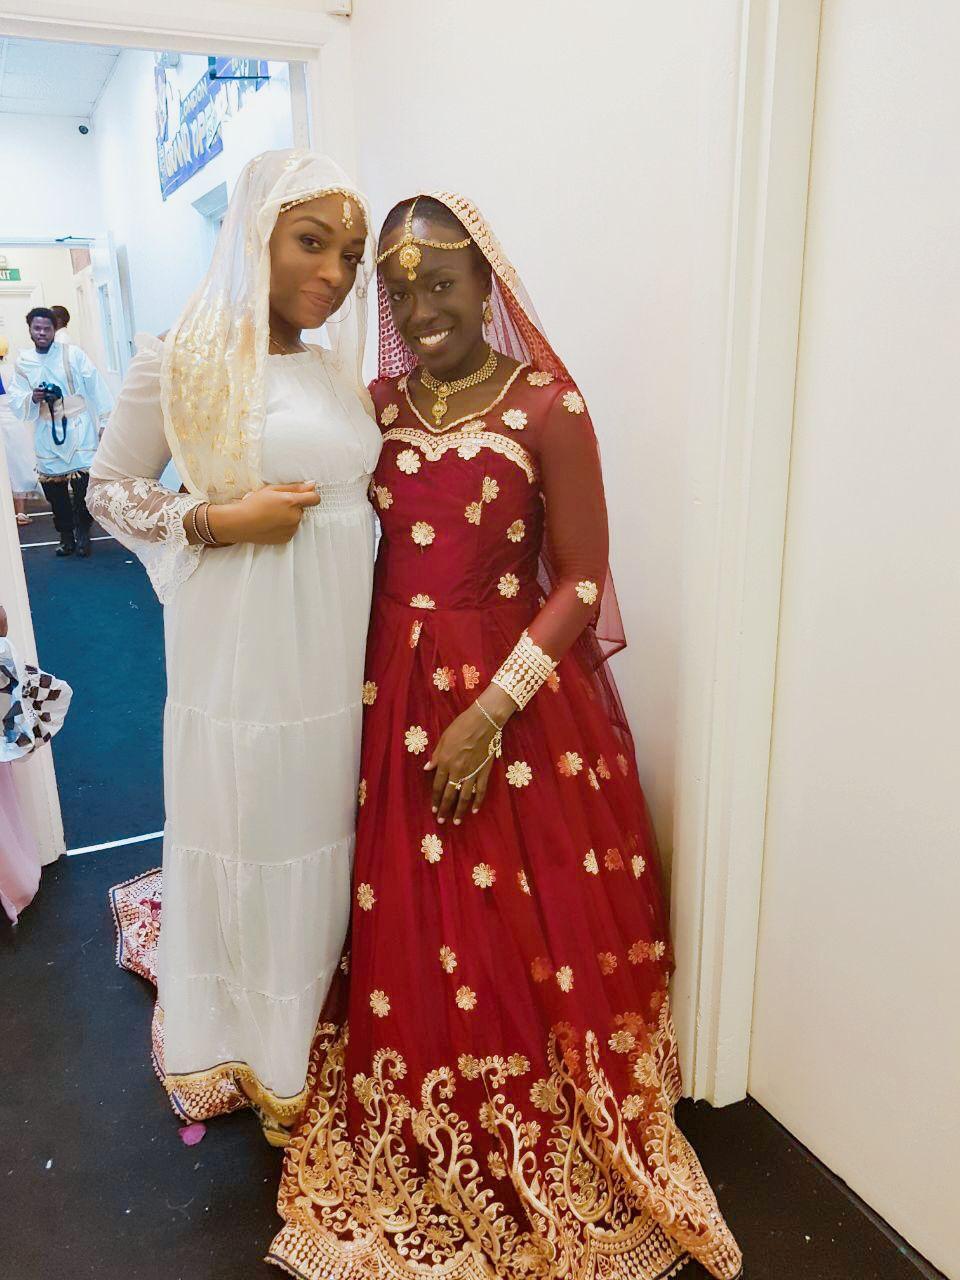 Hebrew Israelite Wedding Attire Off 79 Quality Assurance,Boat Neck Sleeveless Wedding Dress